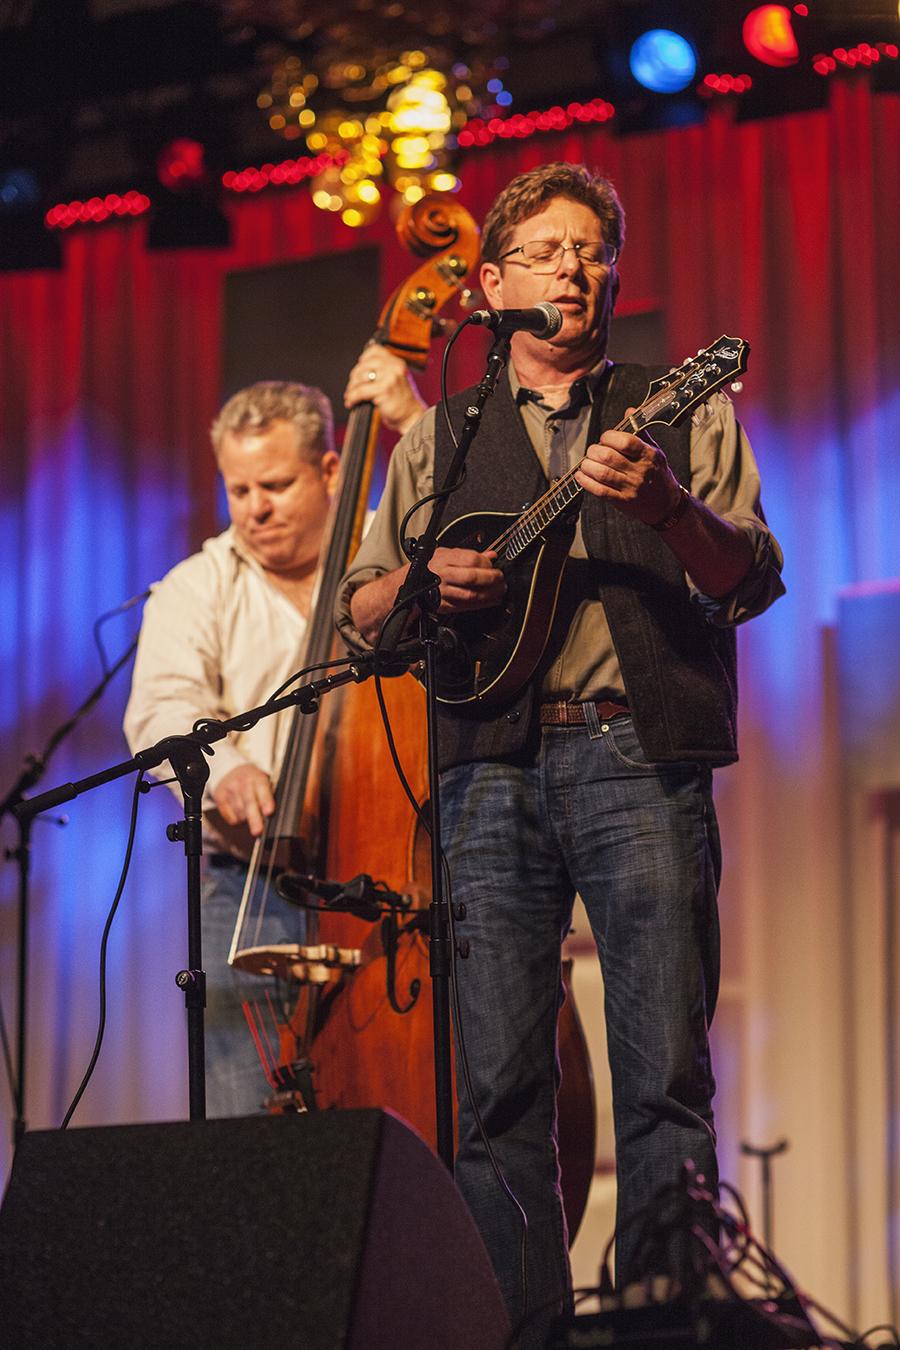 Tim O'Brien and Mike Bub